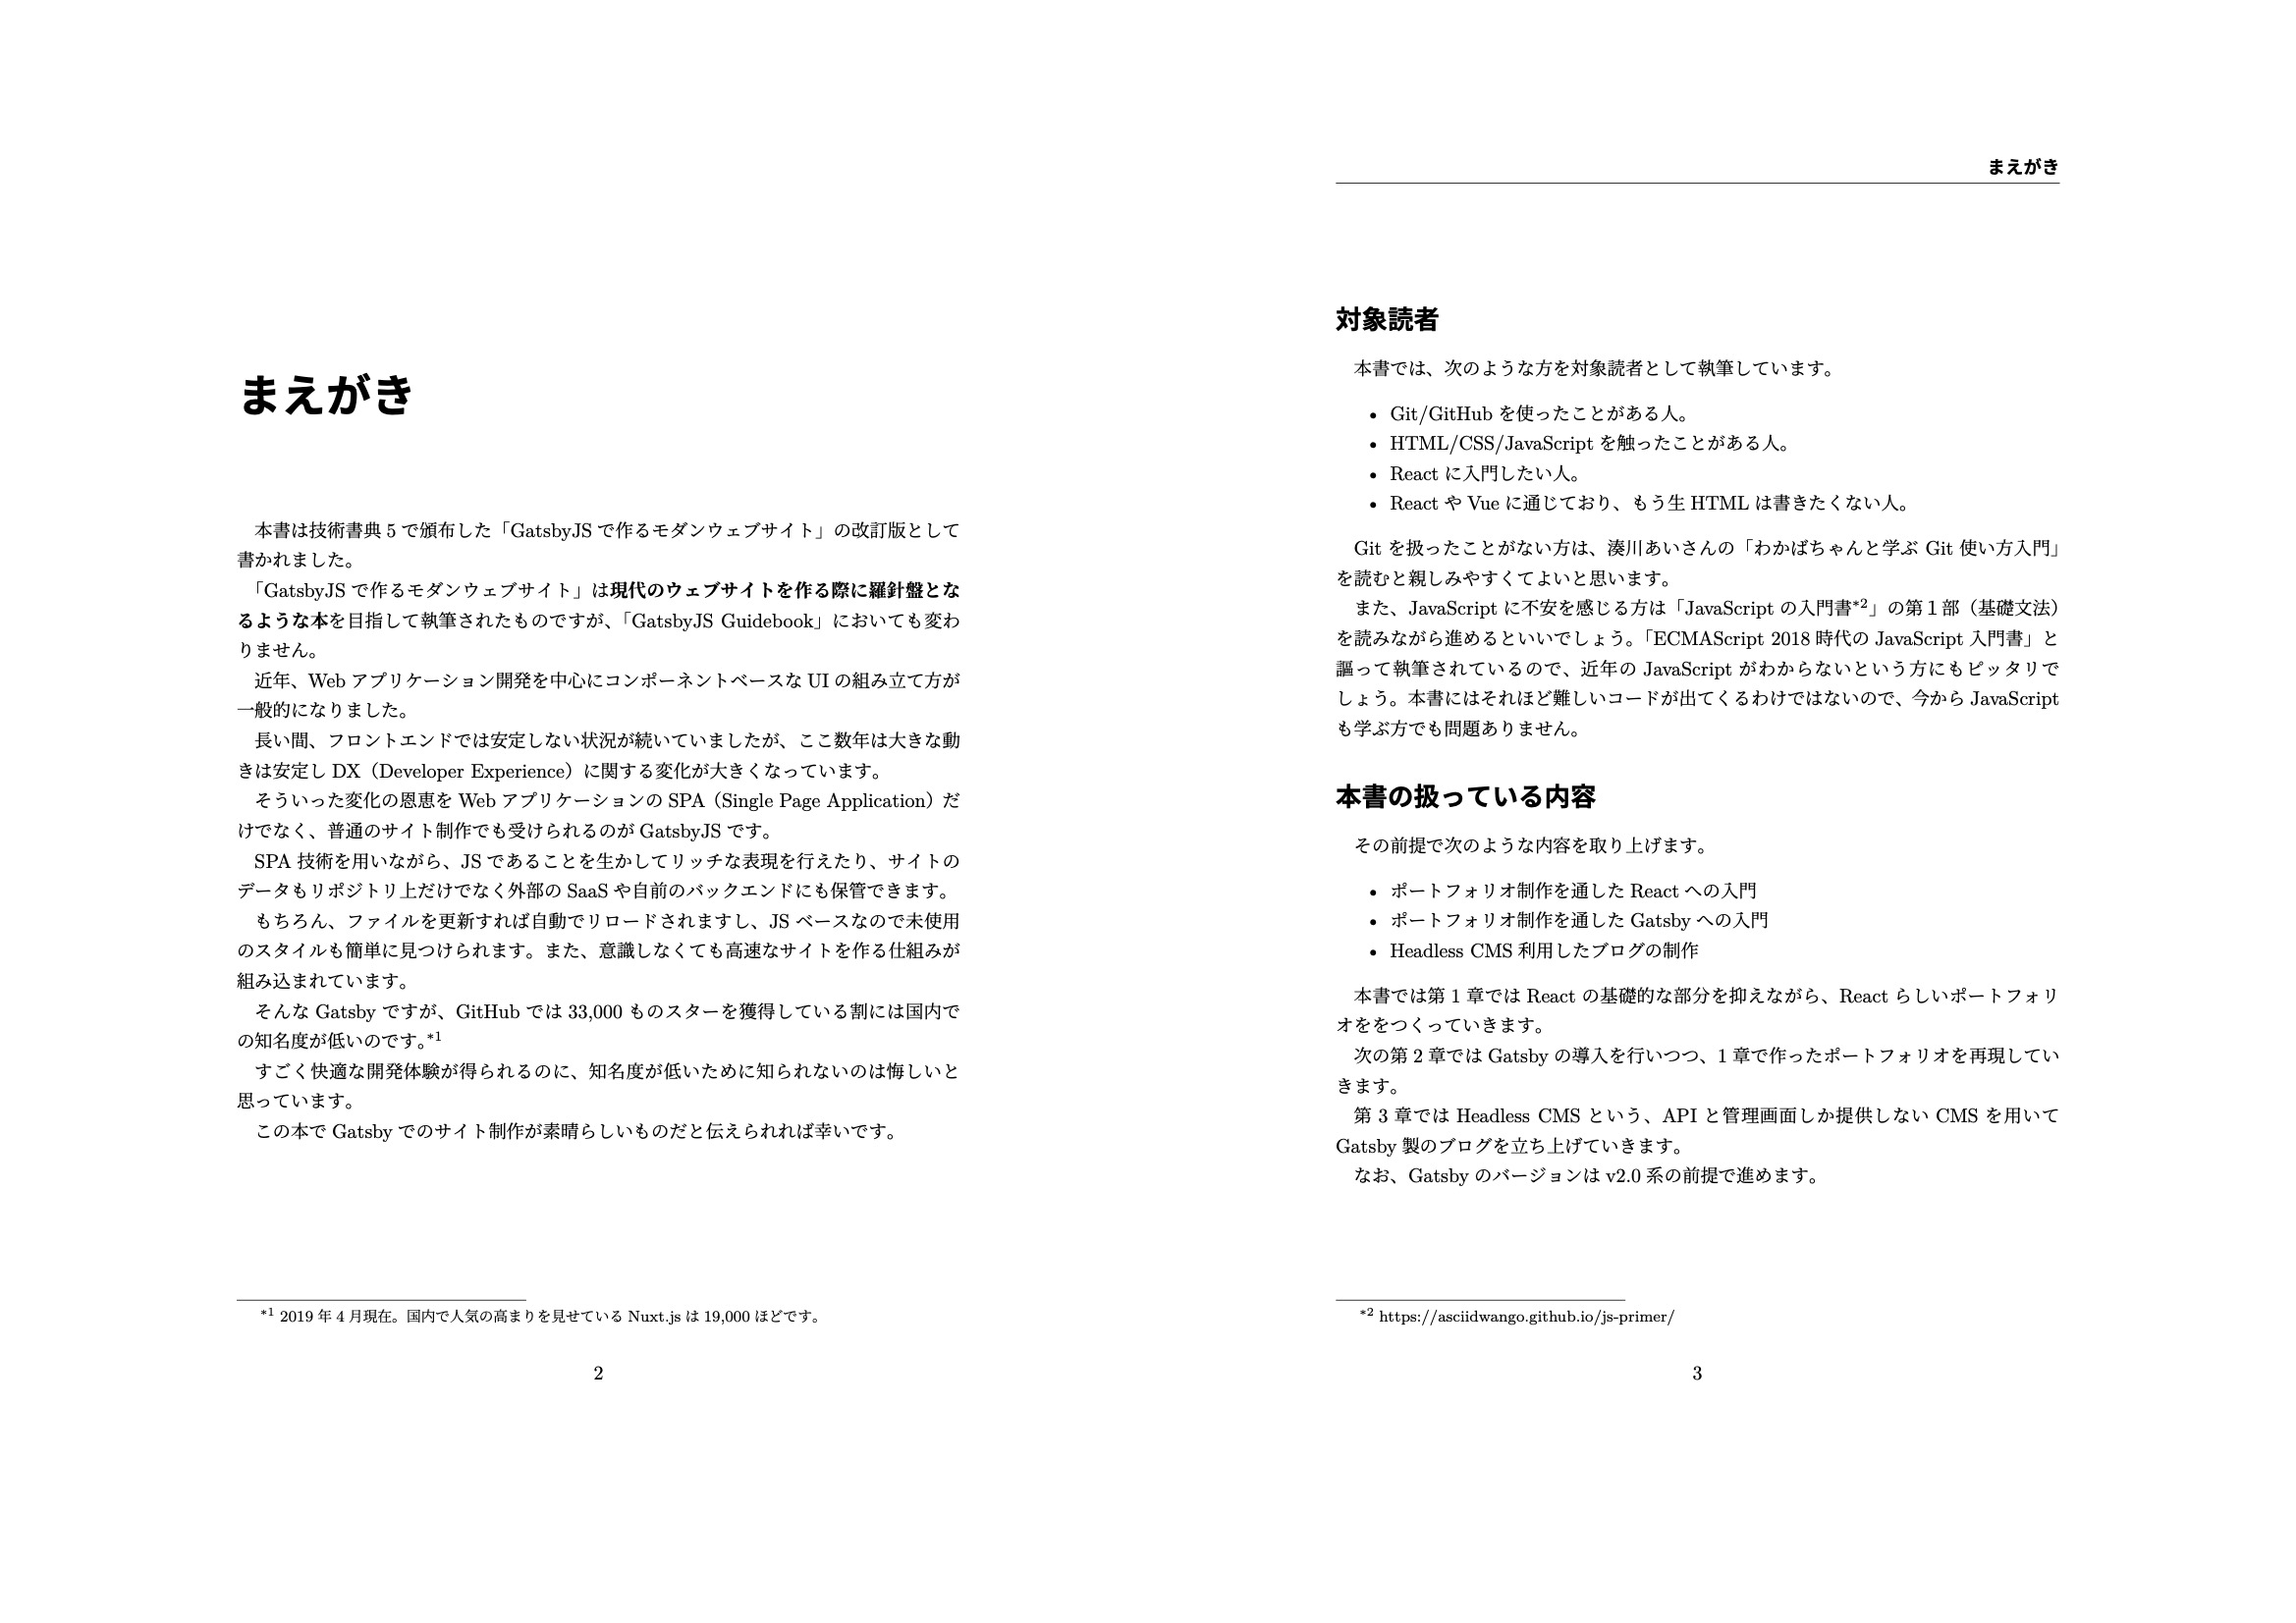 gatsby-guidebook3.jpeg (421.0 kB)